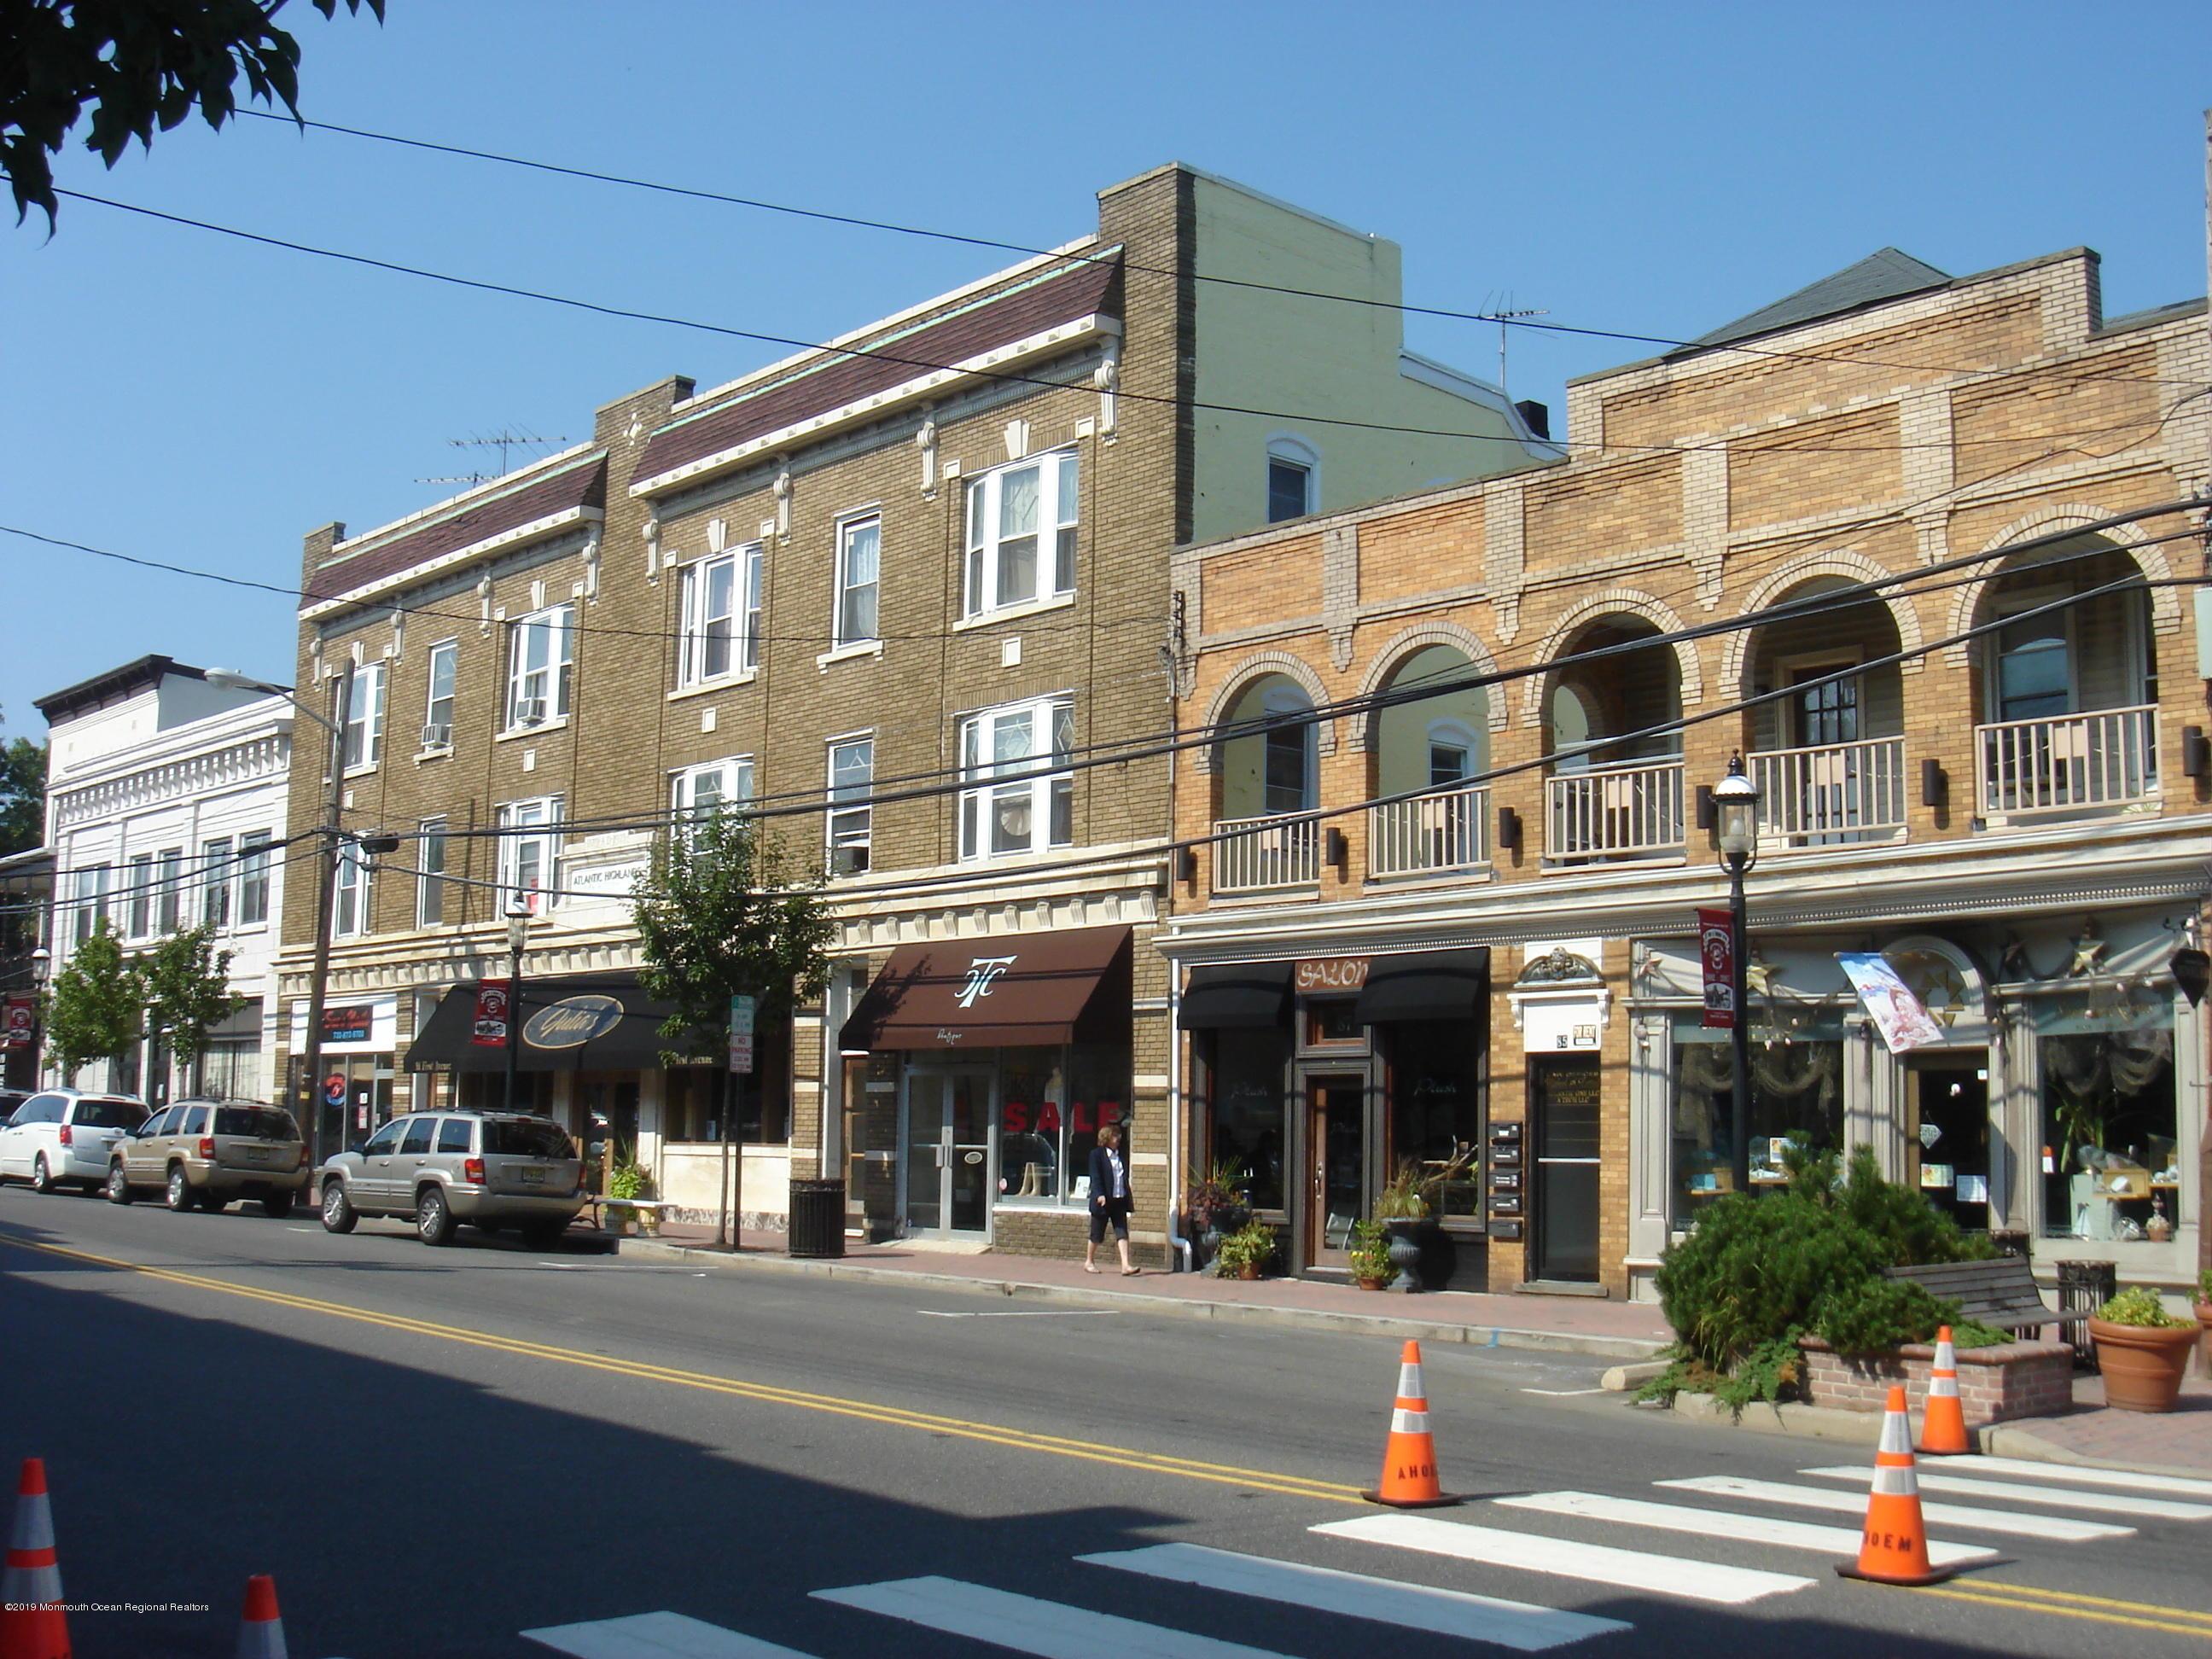 Photo of First Avenue #B2, Atlantic Highlands, NJ 07716